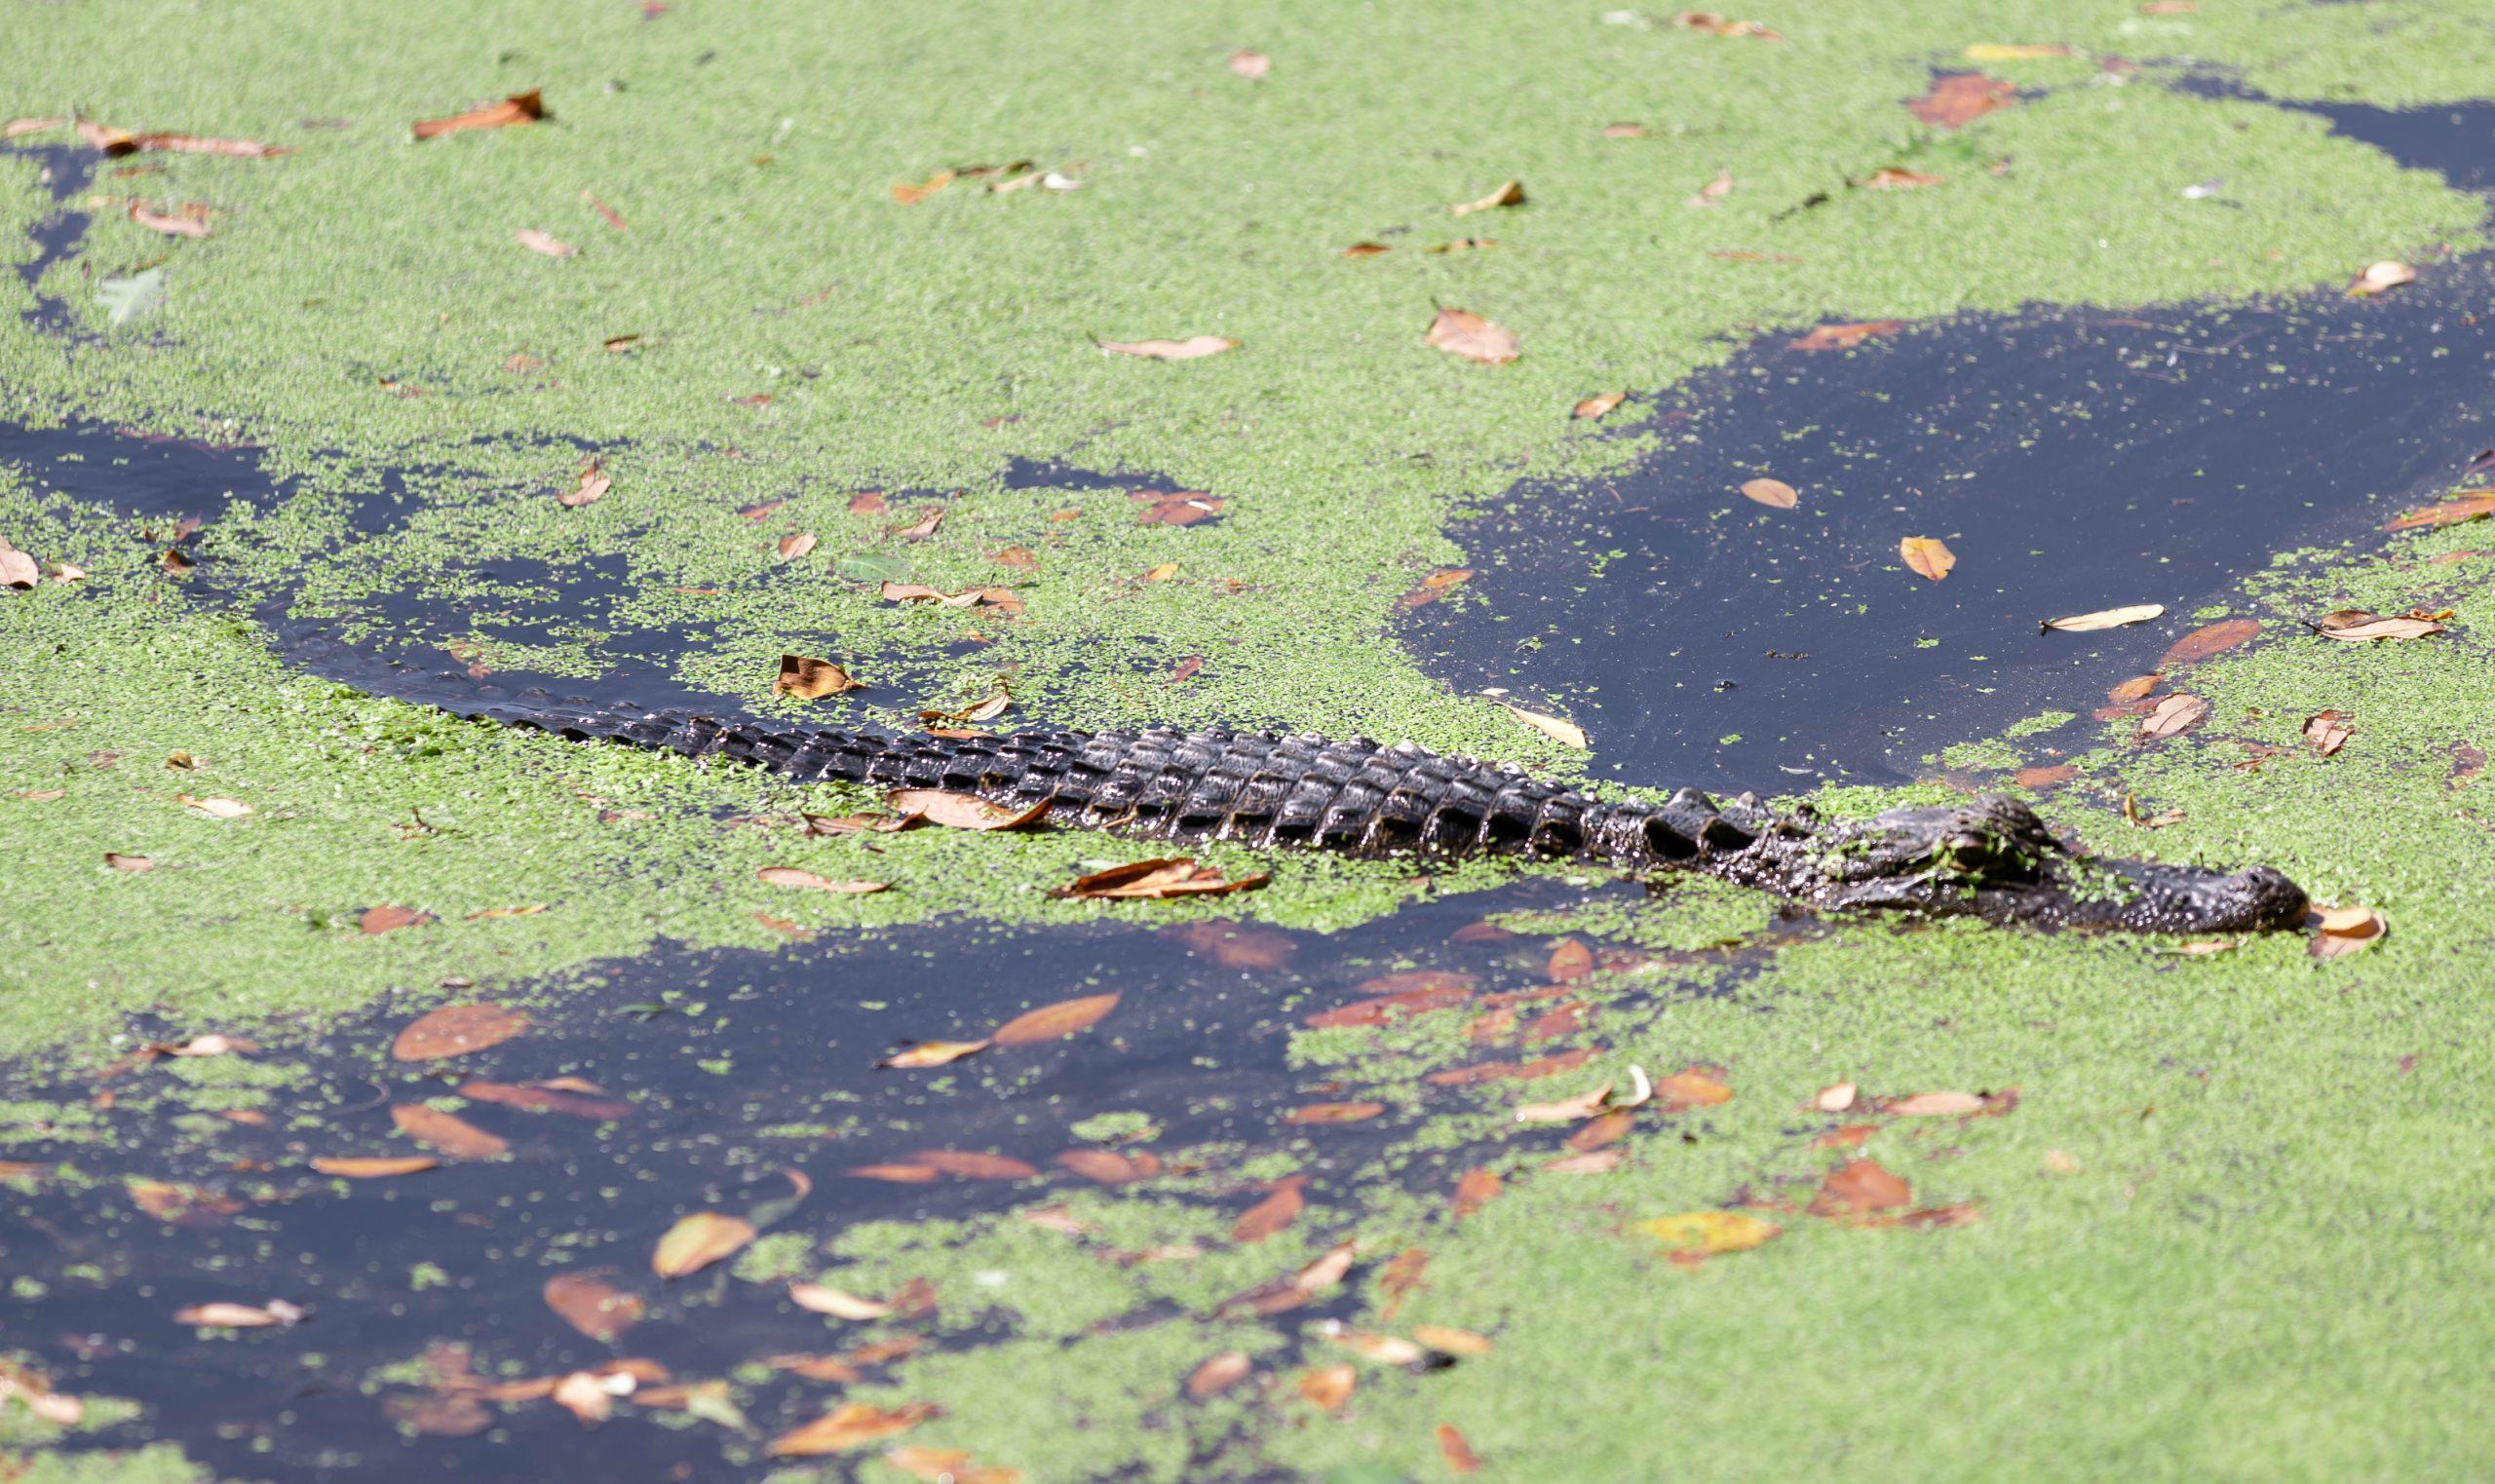 Alligator in Duckweed at Audubon Swamp Garden Inside Magnolia Plantation in Charleston, South Carolina Photographed by Luxury Travel Writer and Photographer Annie Fairfax